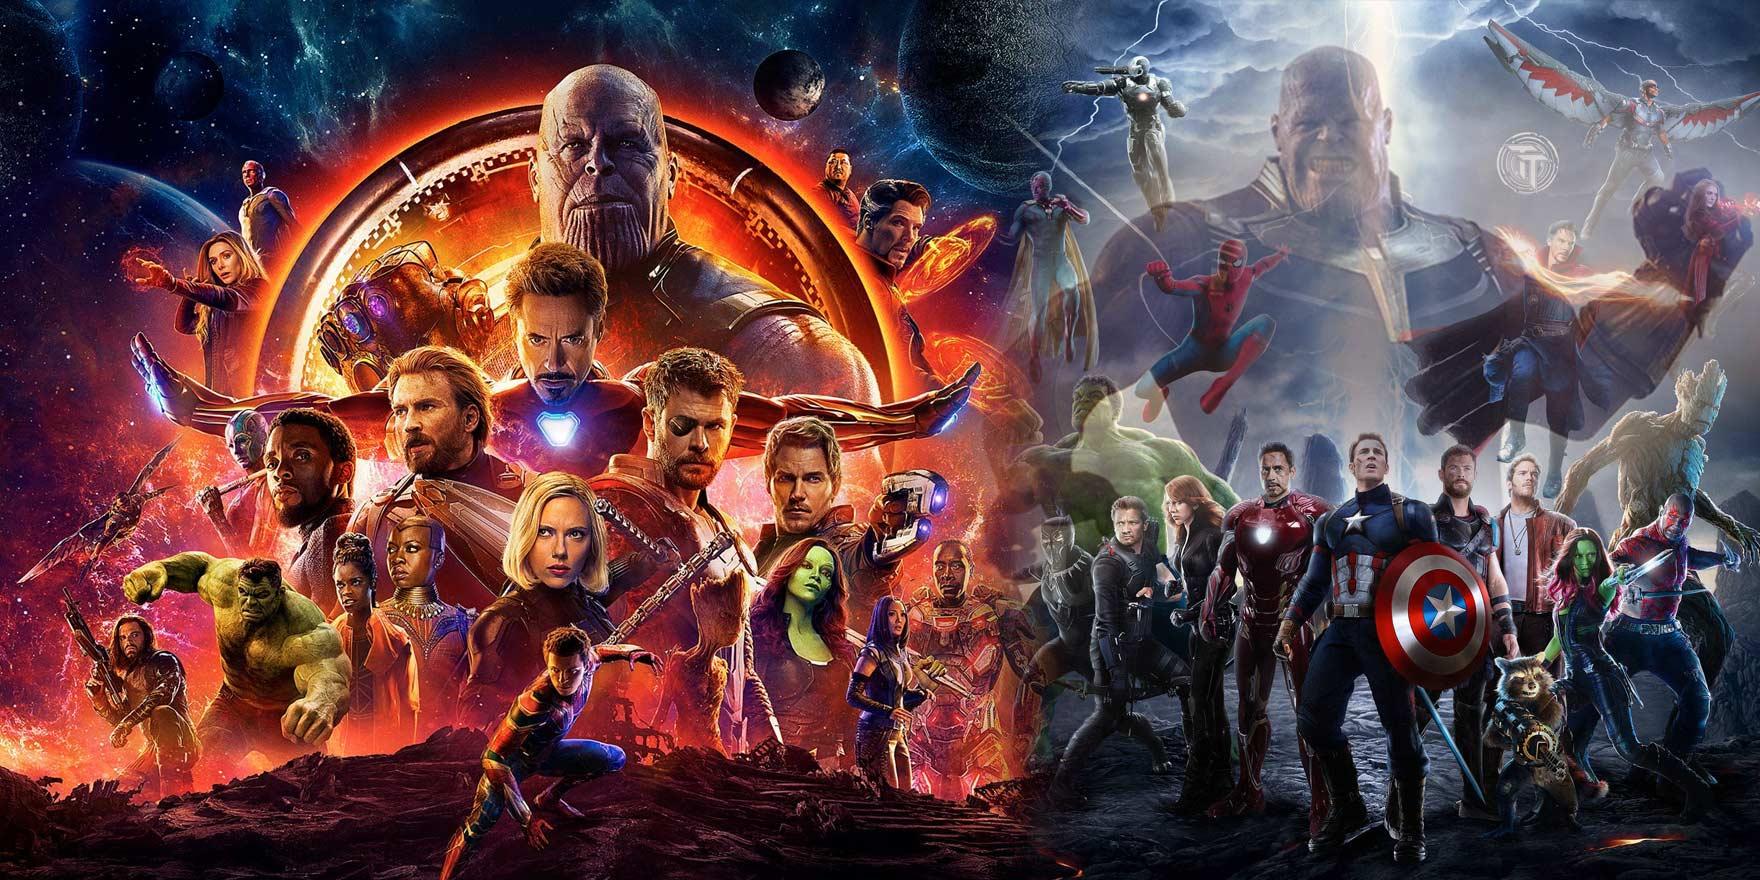 Avengers: Infinity War - Header Image